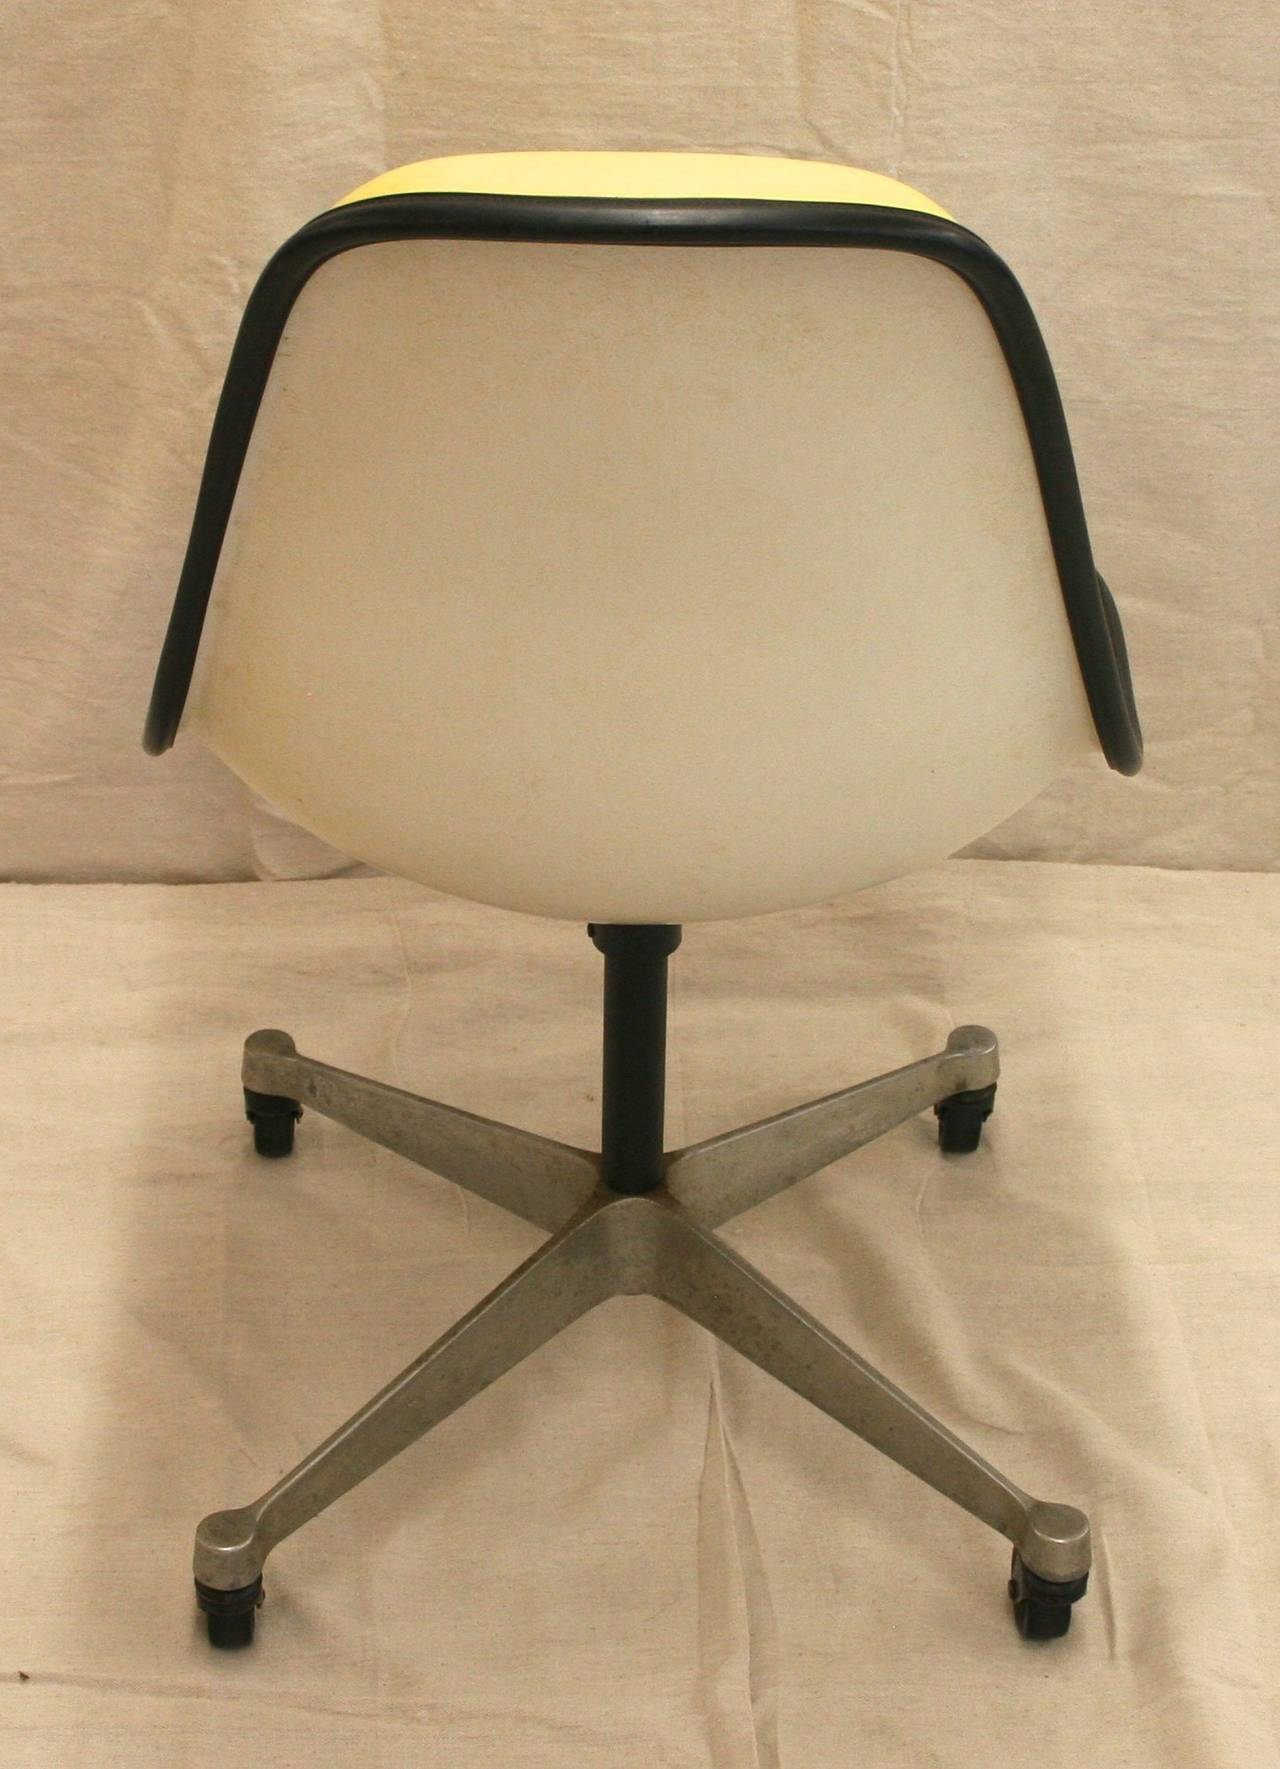 fiberglass shell chair antique victorian folding rocking mid century herman miller at 1stdibs